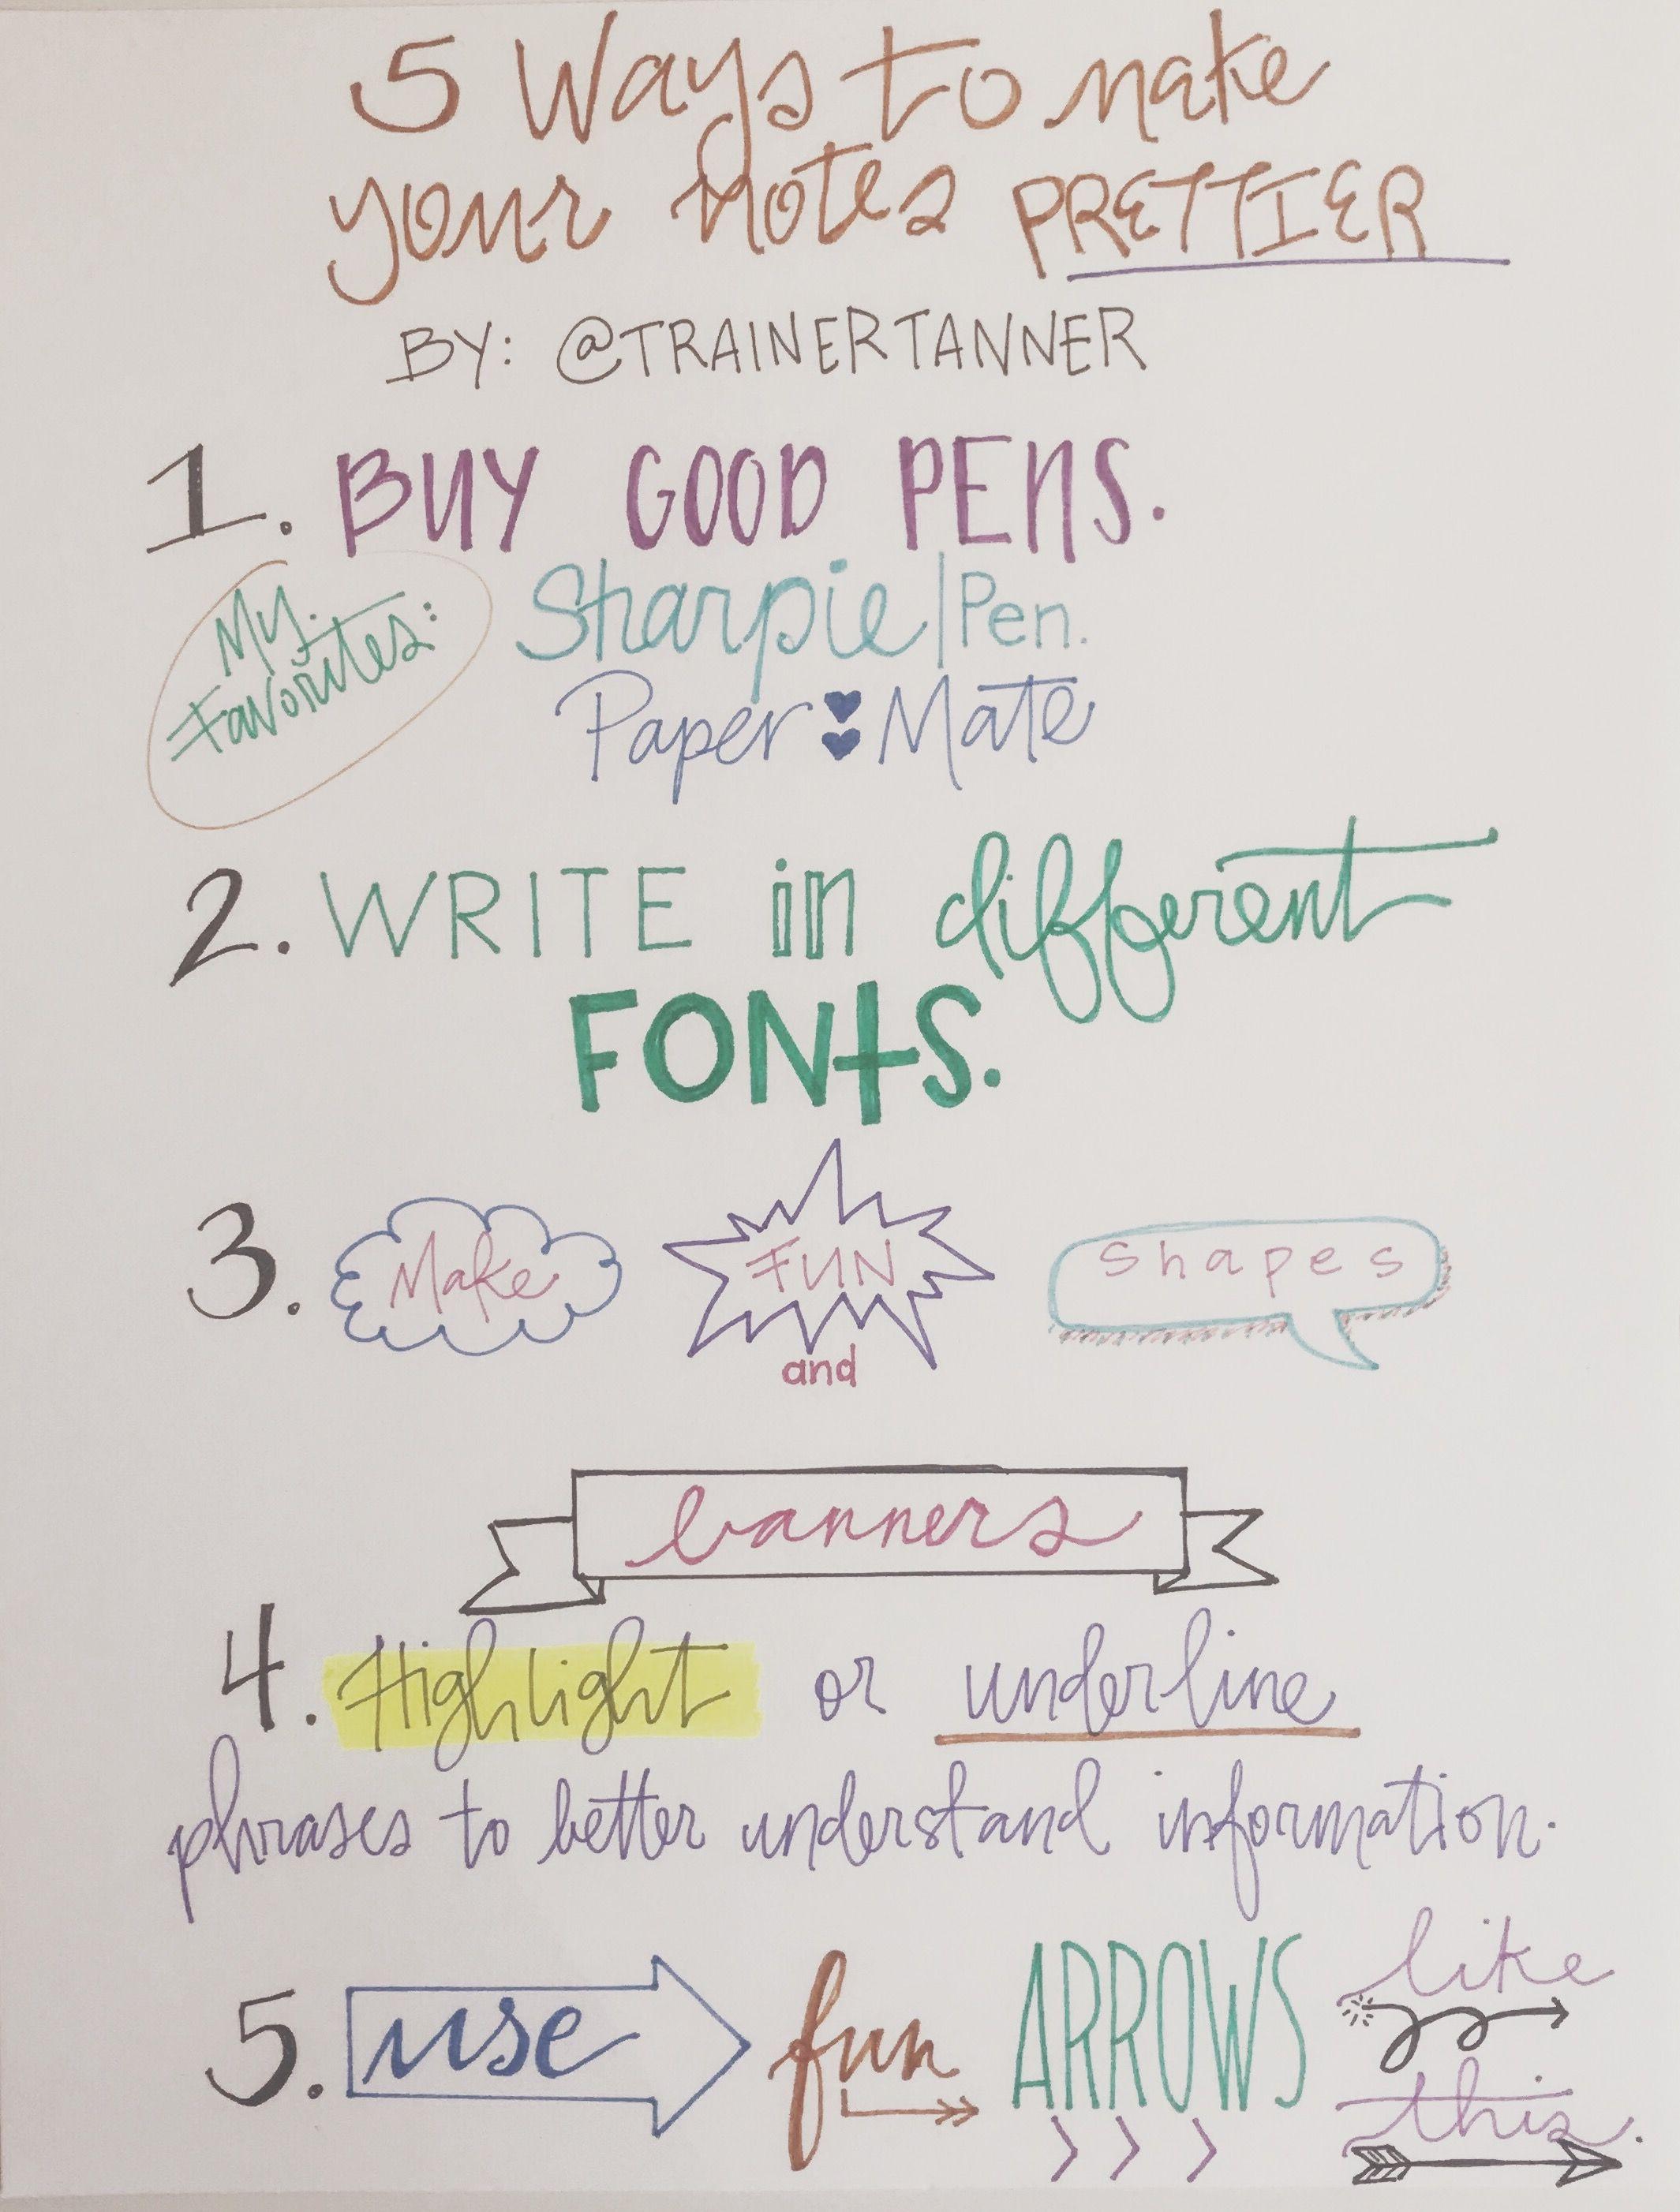 5 Ways To Make Your Notes Prettier As An Entrepreneur I